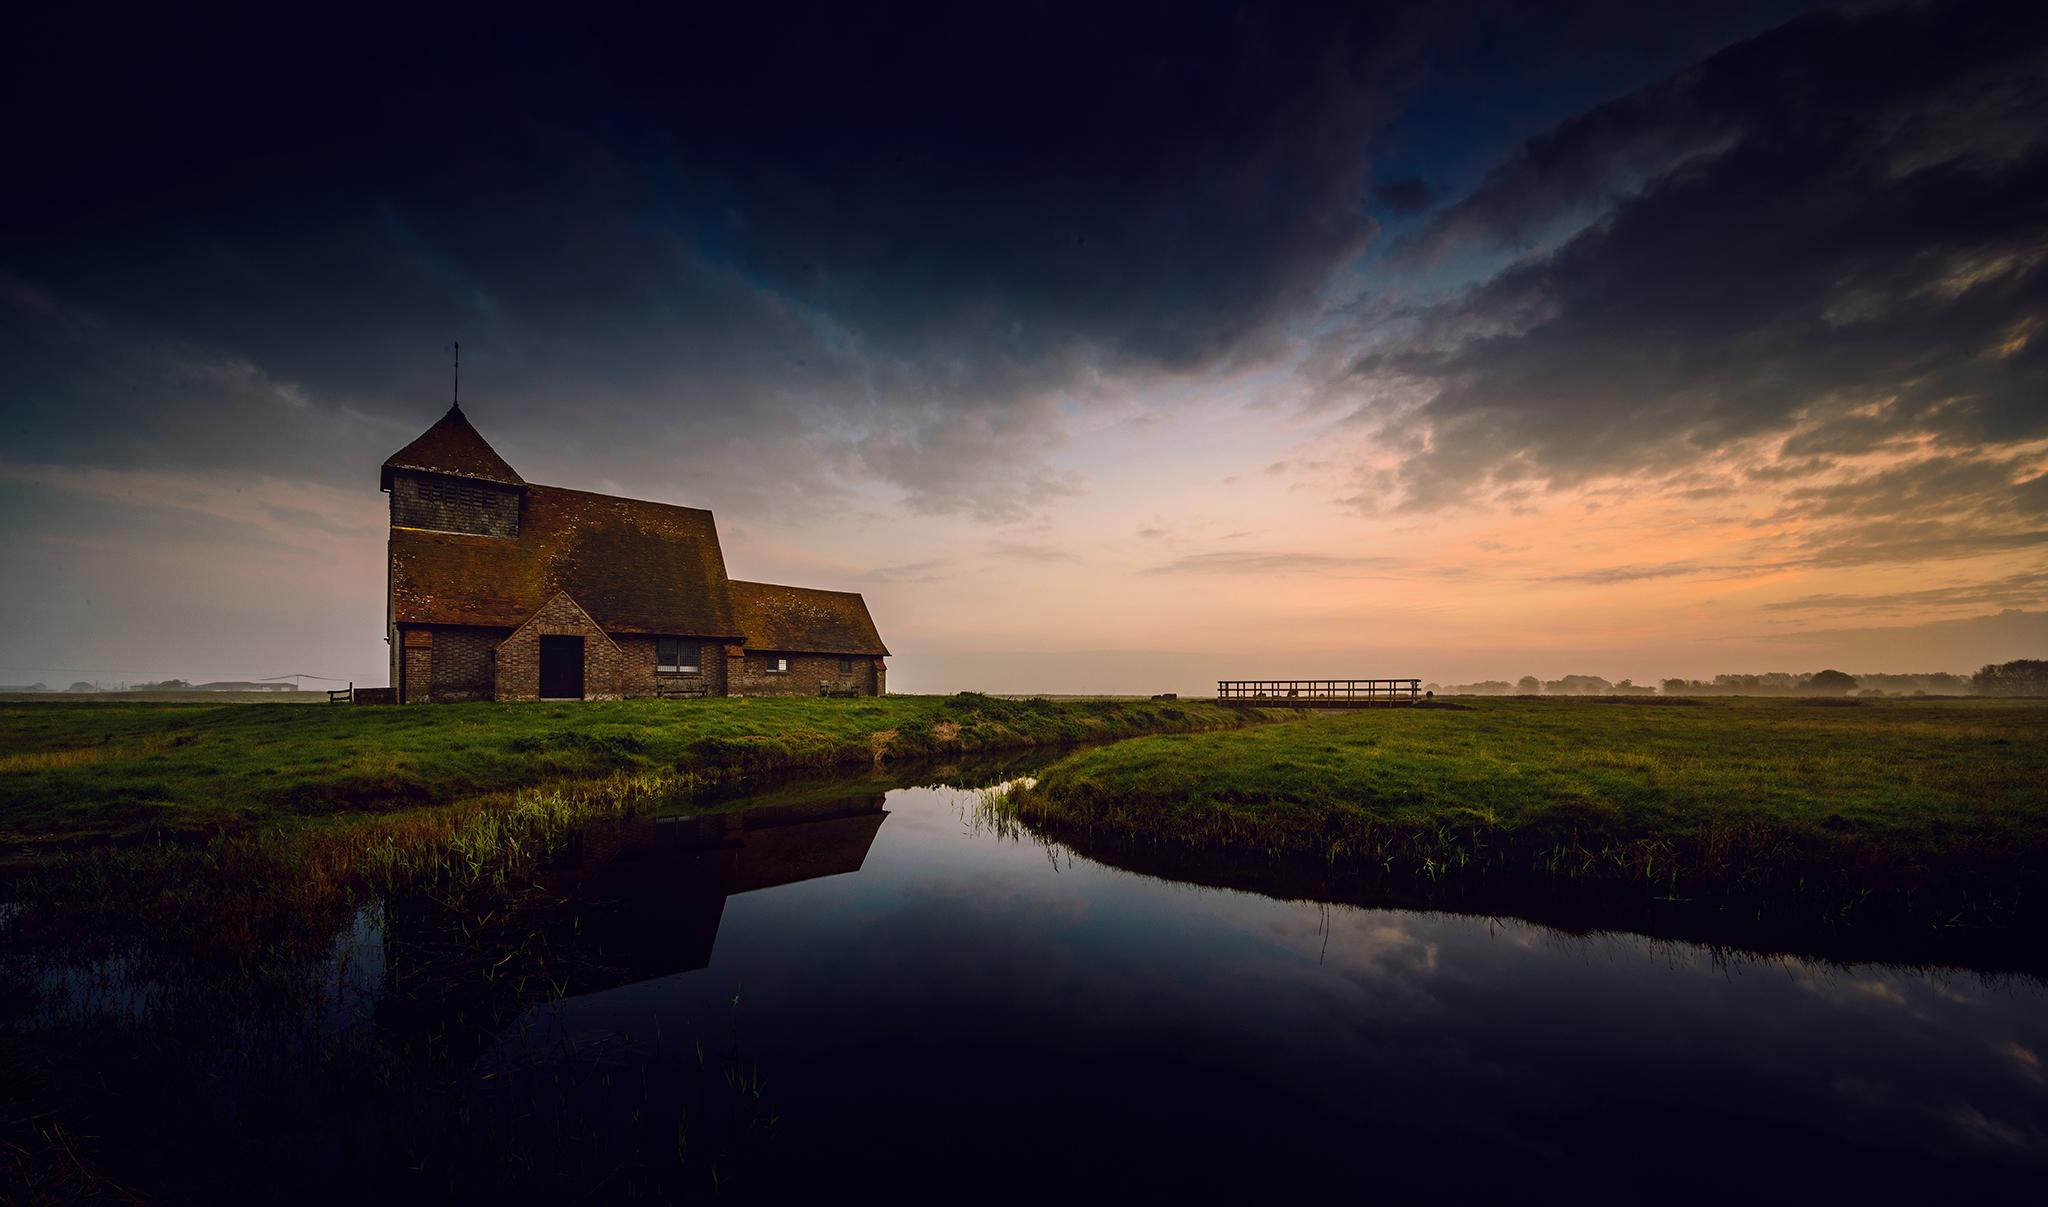 Fairfield Church, United Kingdom